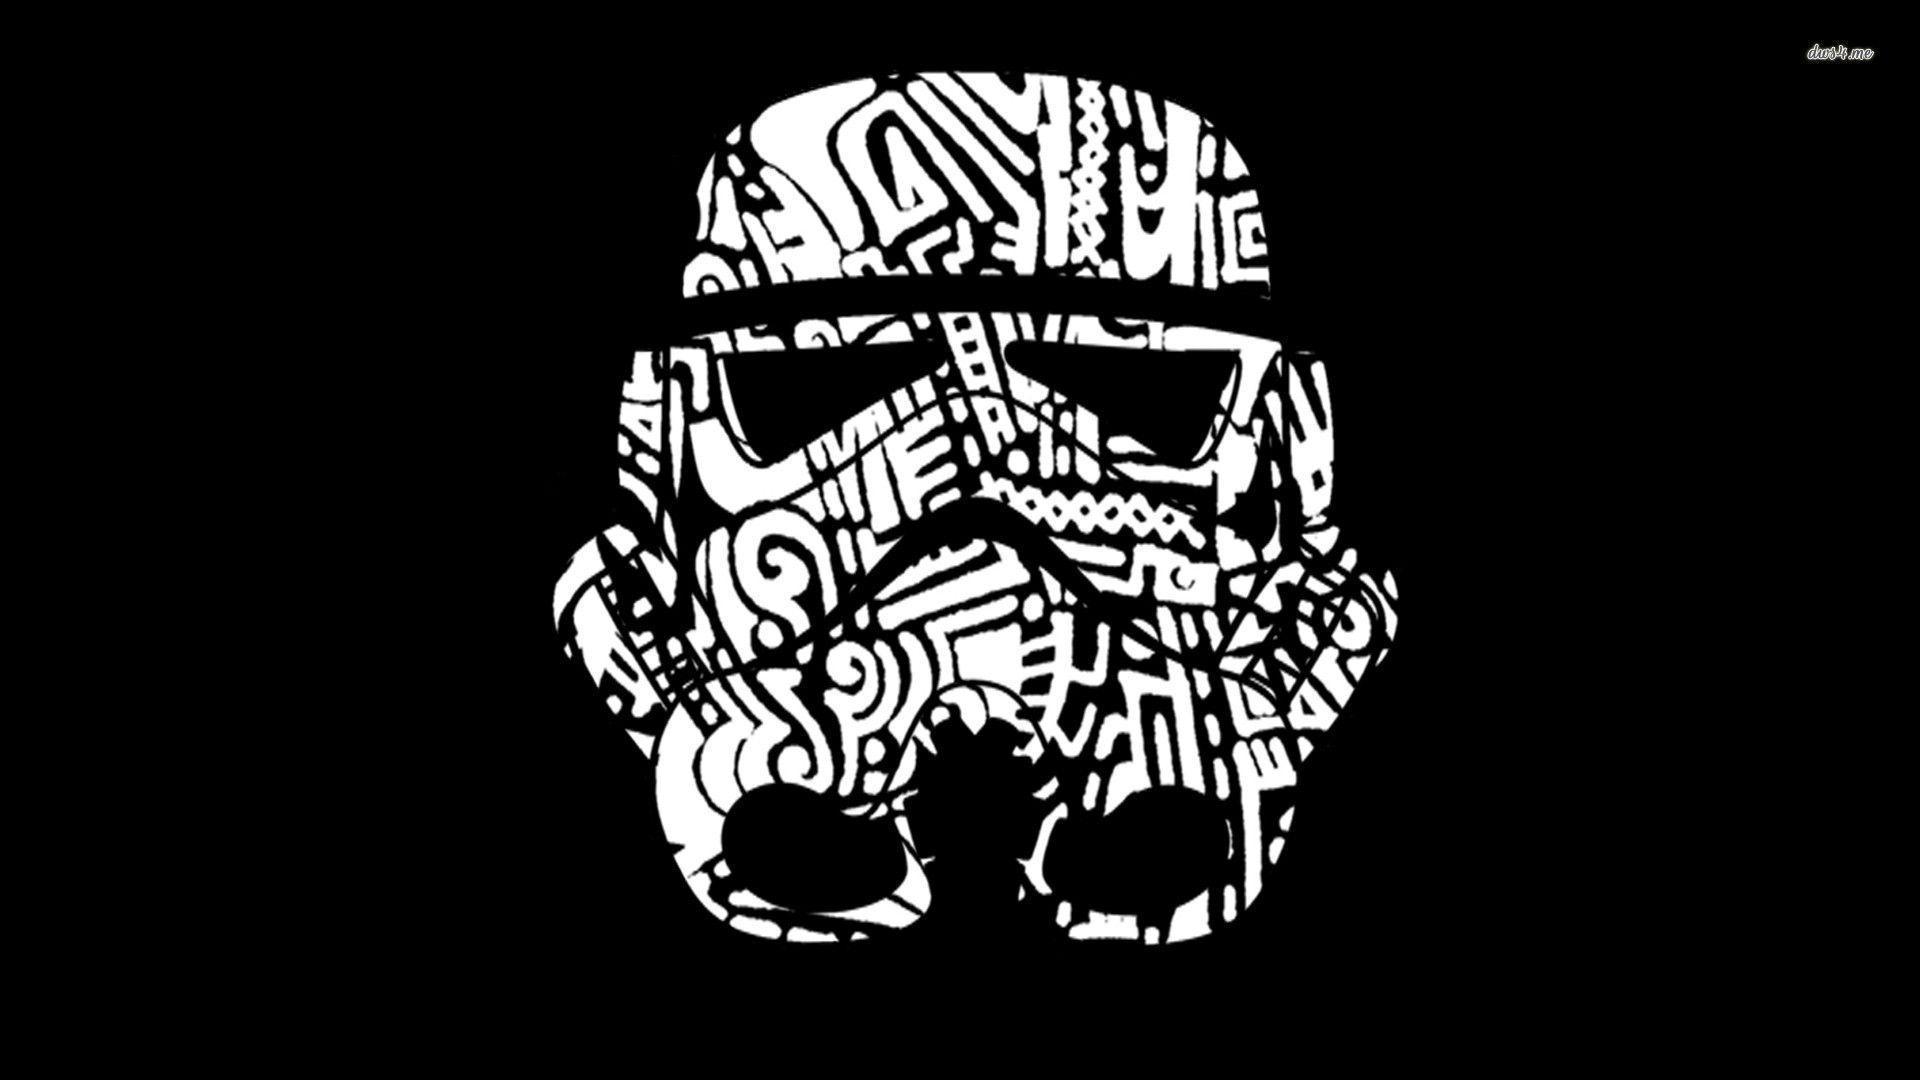 stormtrooper wallpaper – wallpapermonkey.com